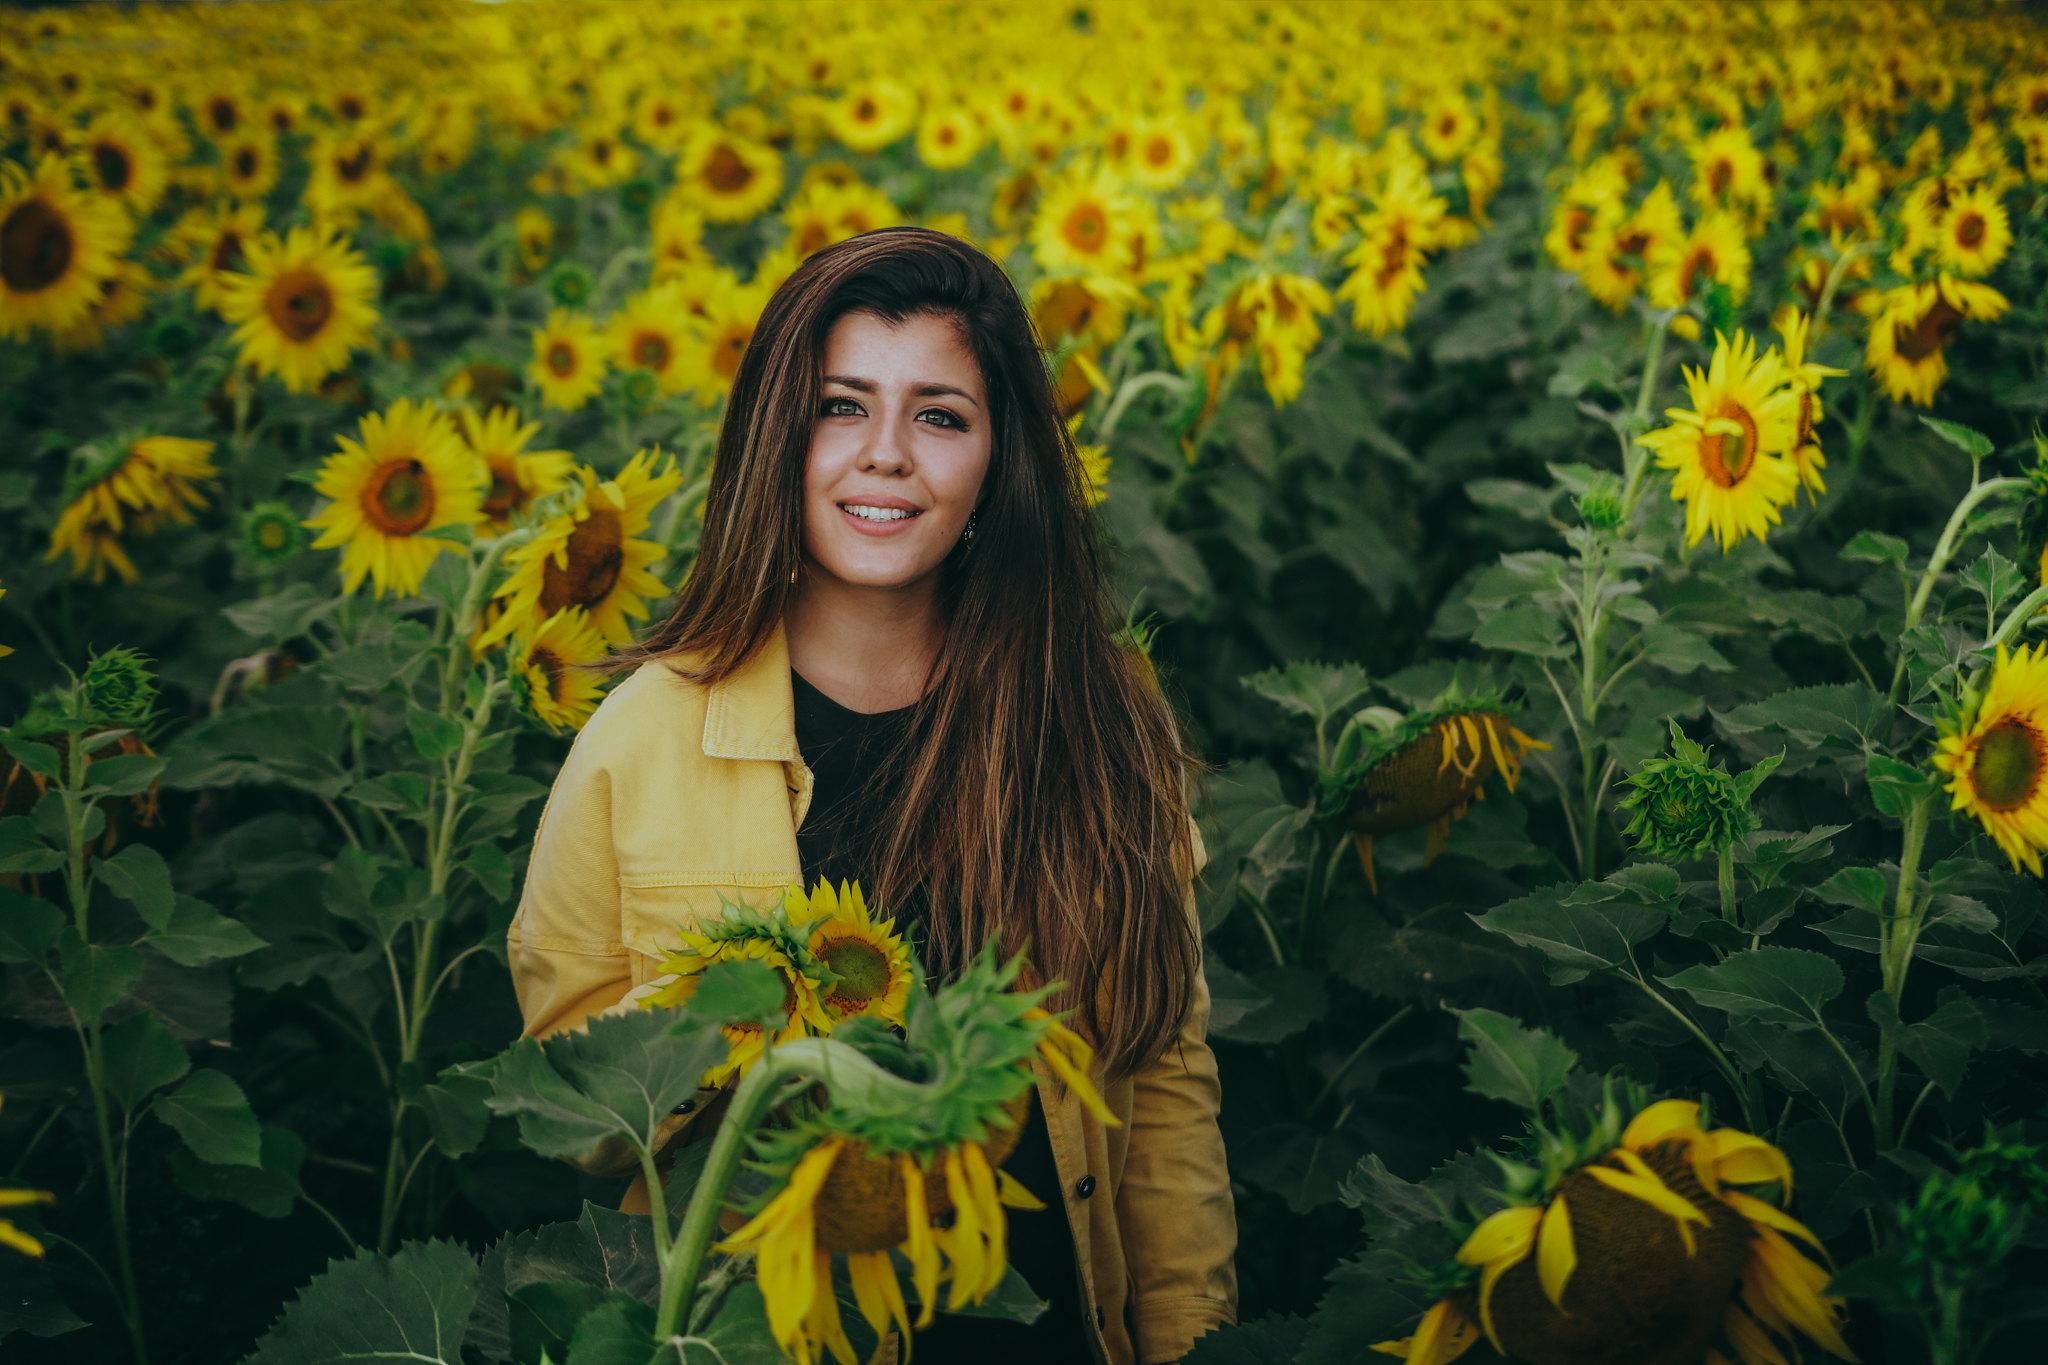 auringonkukkia-28